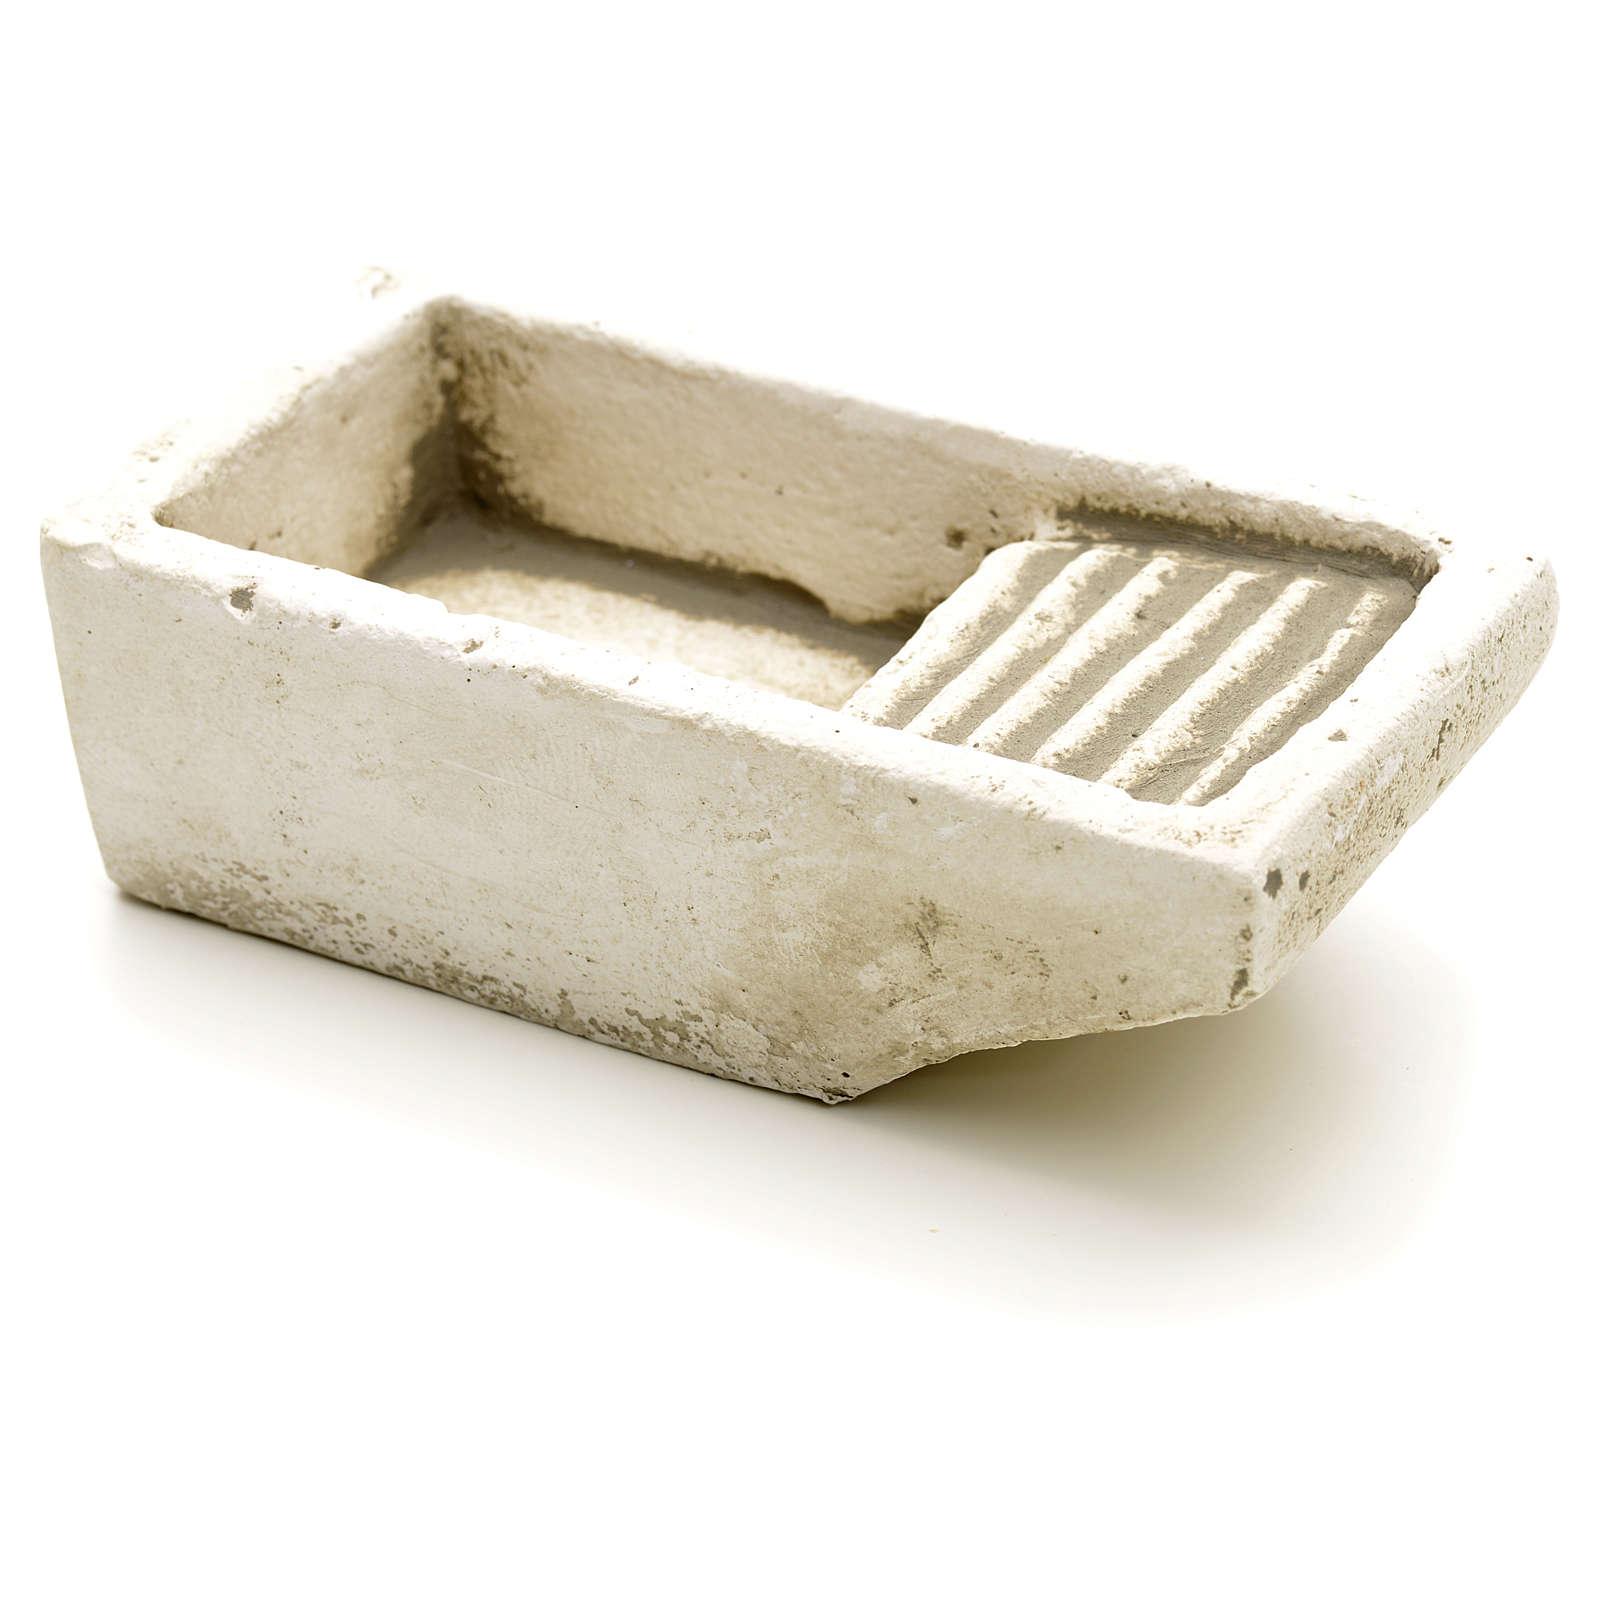 Batea de lavar en yeso pesebre hecho por ti 4